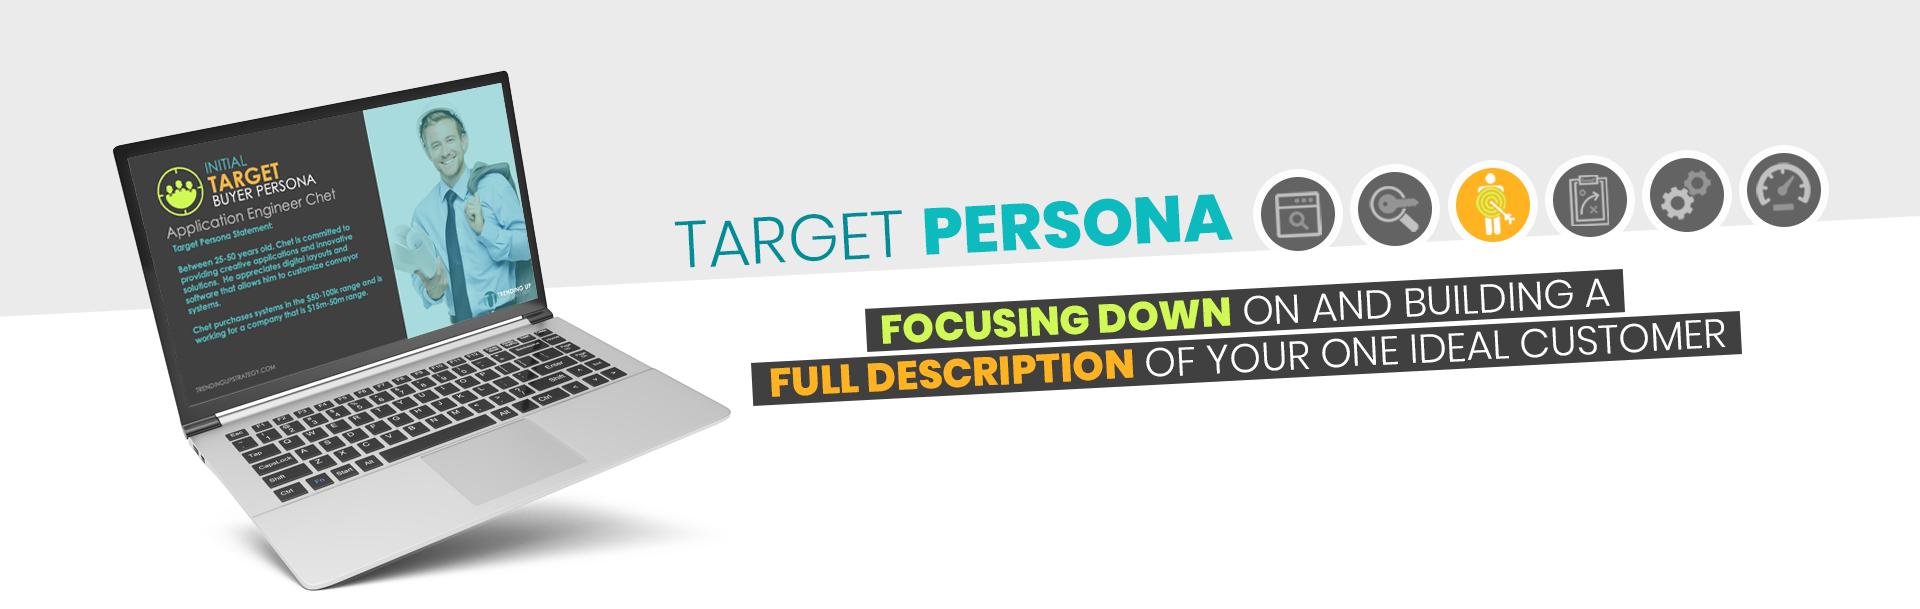 Target Persona - Focus Down